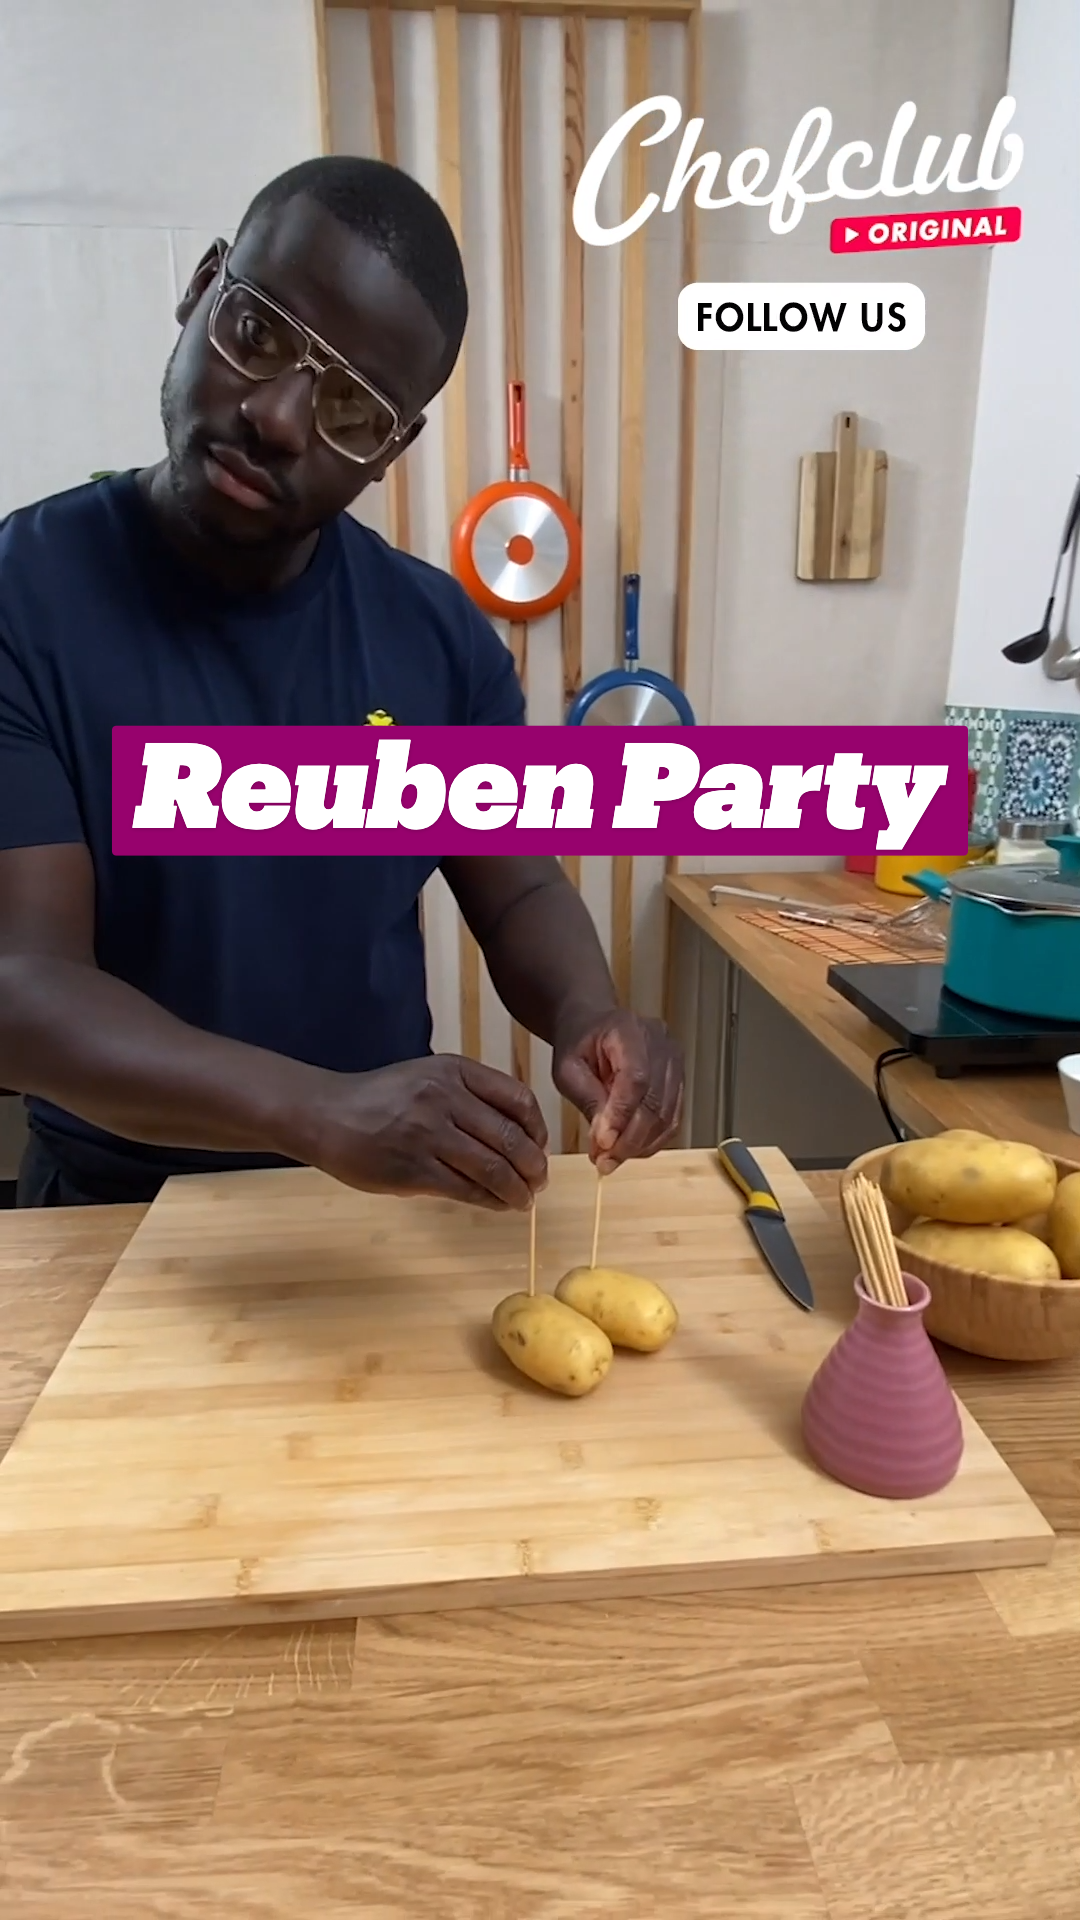 Reuben Party